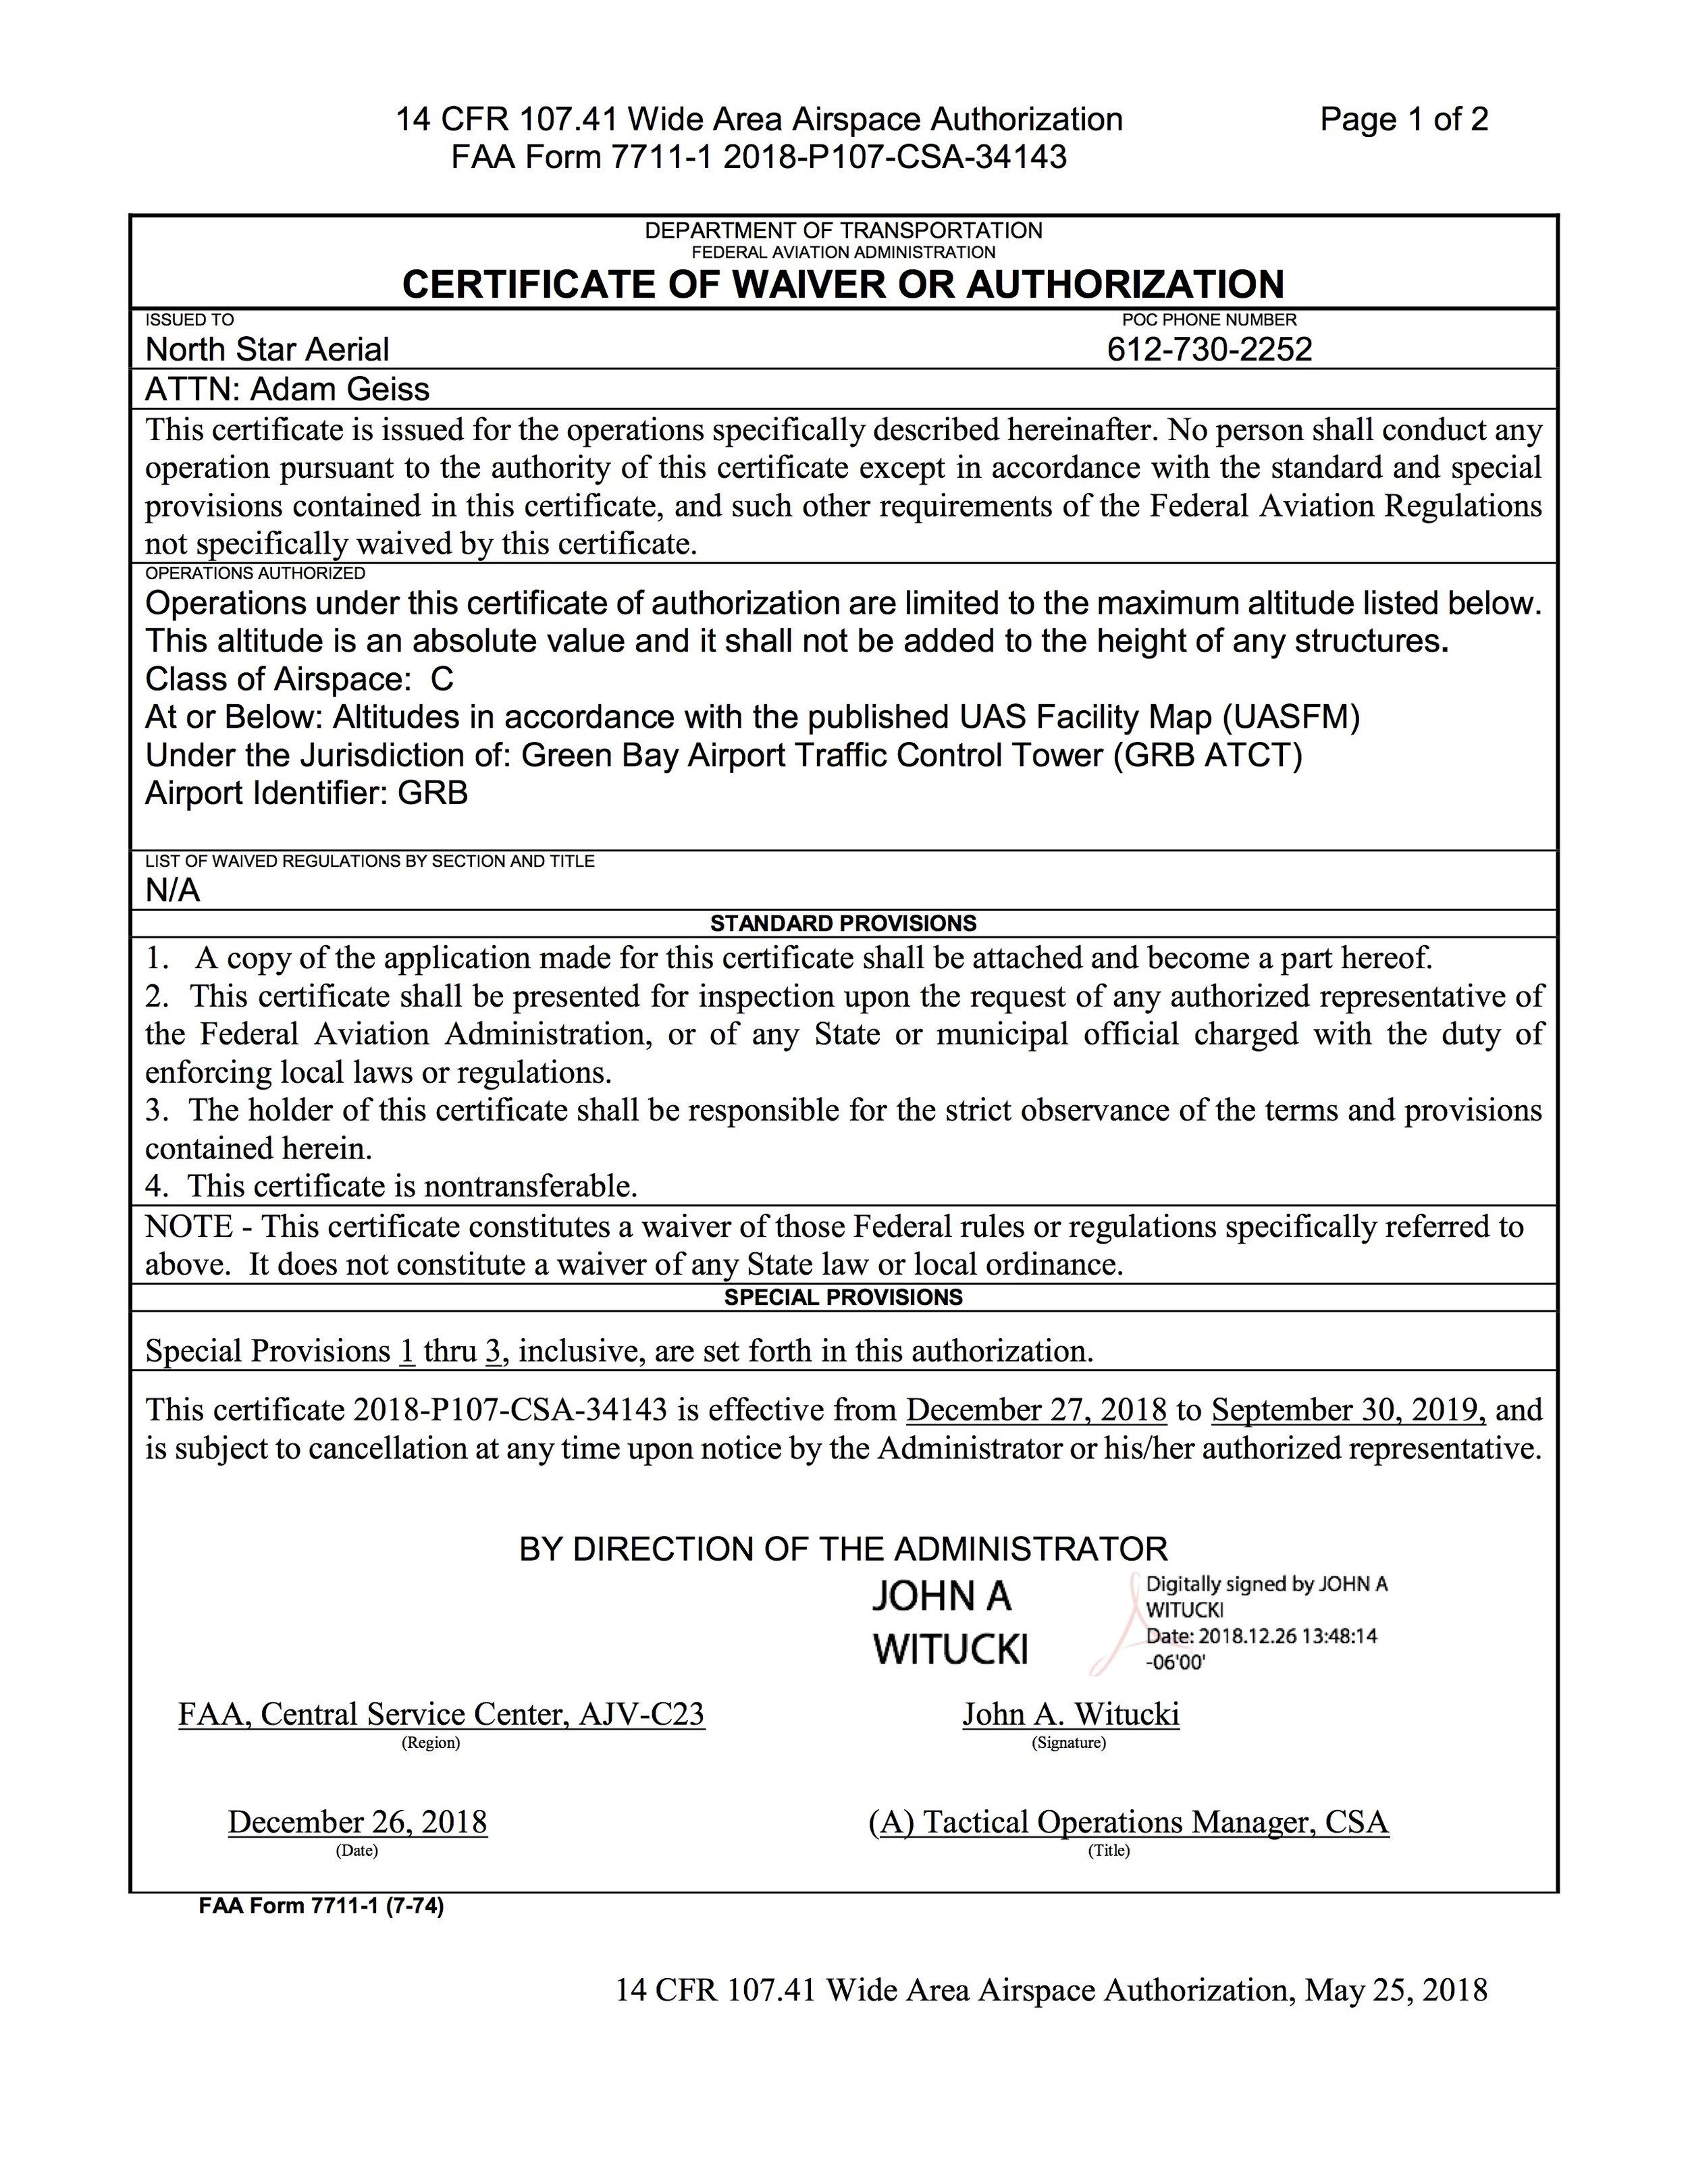 FAA Form 7711-1 2018-P107-CSA-34143 GRB.jpg